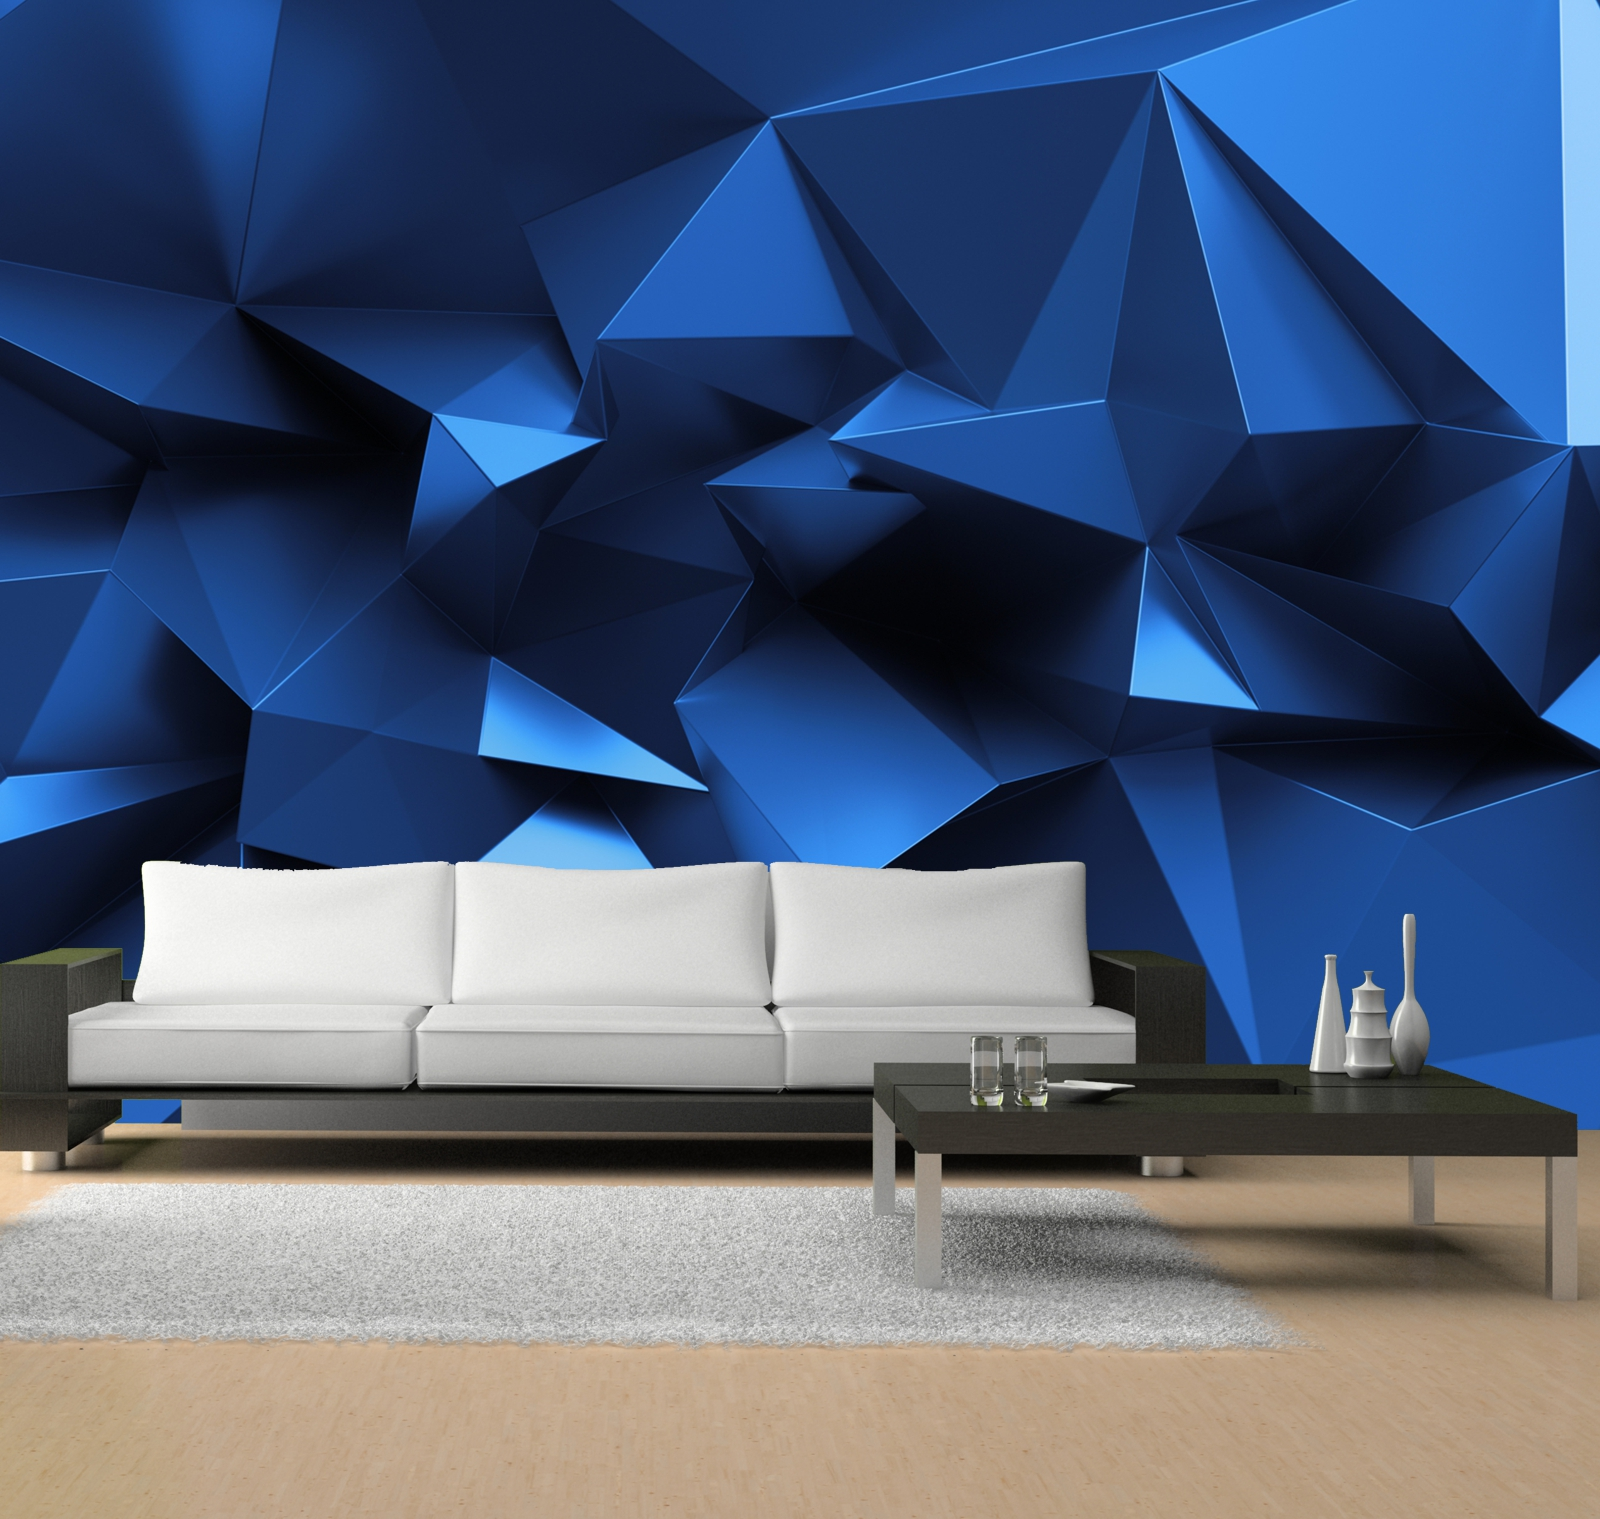 Full Size of Vlies Tapete Fototapete 3d Zacken Dreiecke Blau Muster Mehr Fototapeten Wohnzimmer Küche Schlafzimmer Fenster Wohnzimmer 3d Fototapete